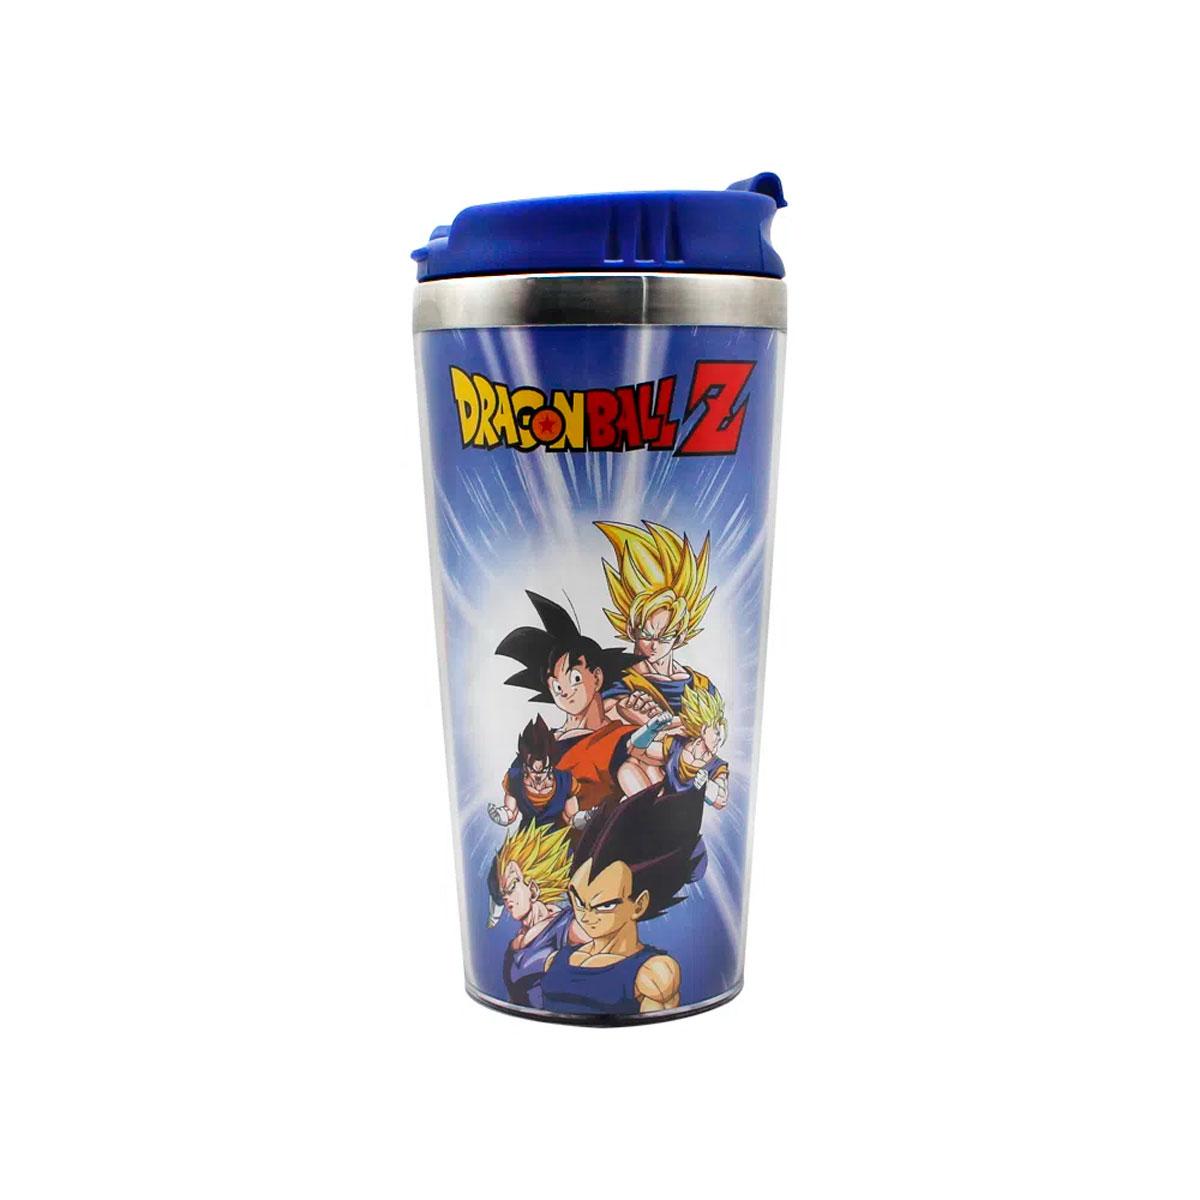 Copo Térmico Dragon Ball Z Goku e Vegeta Saiyajin - Presente Super